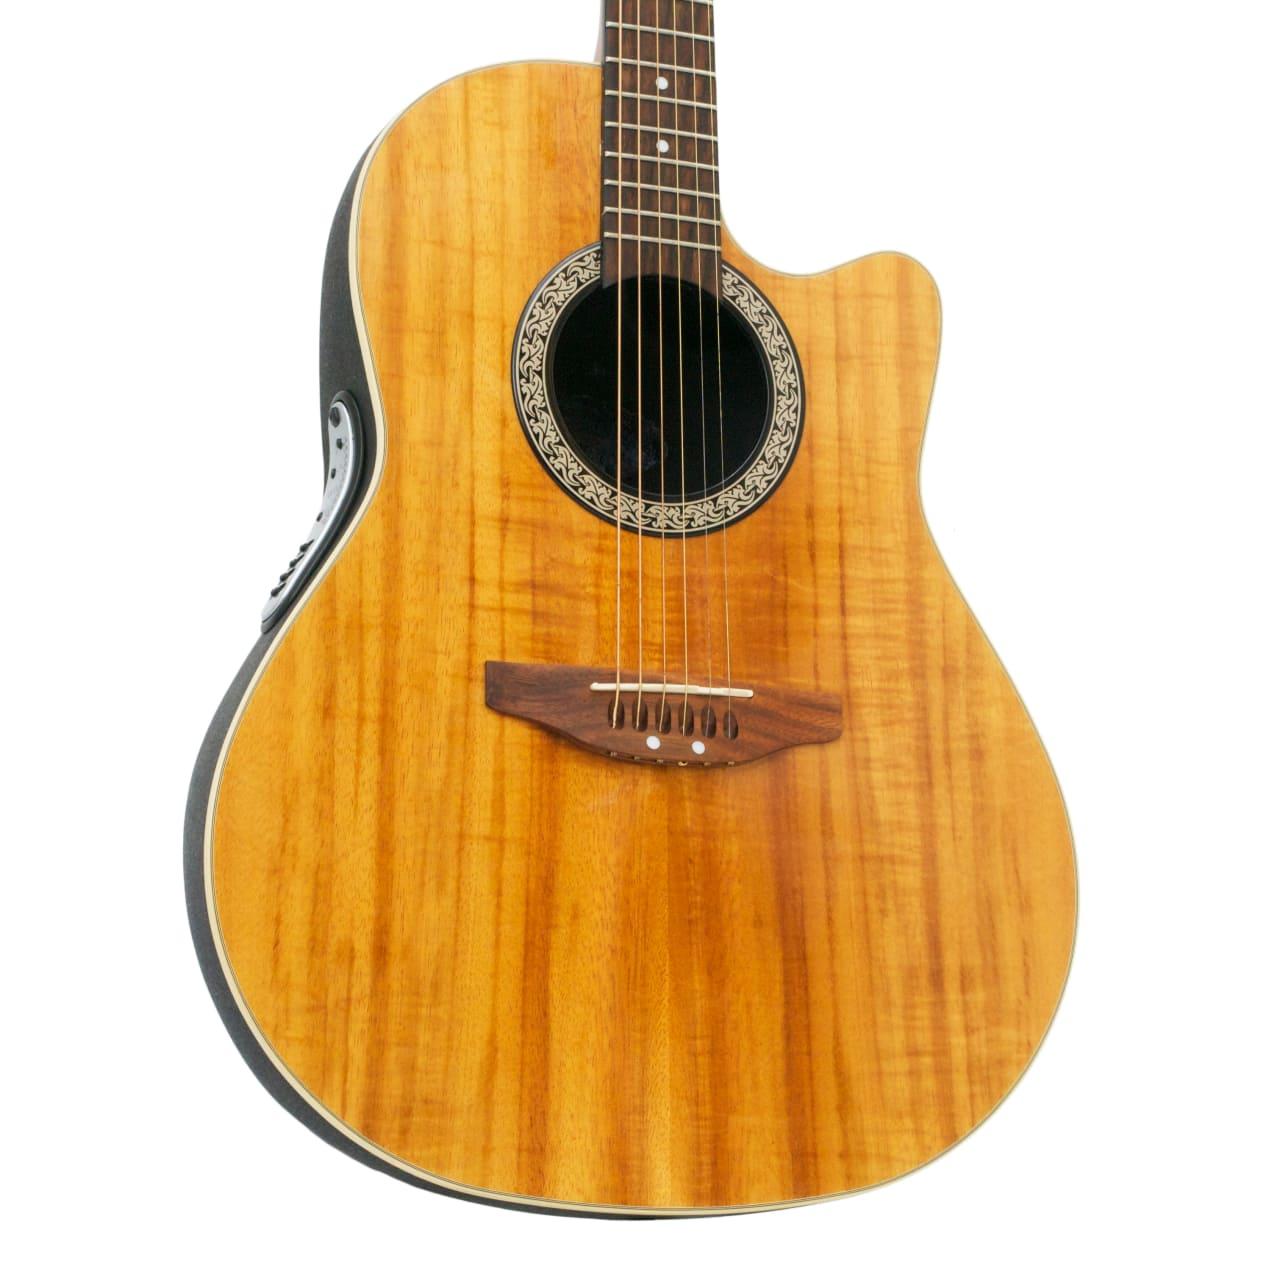 Ovation CK047 Koa Celebrity Acoustic Electric Guitar For ...